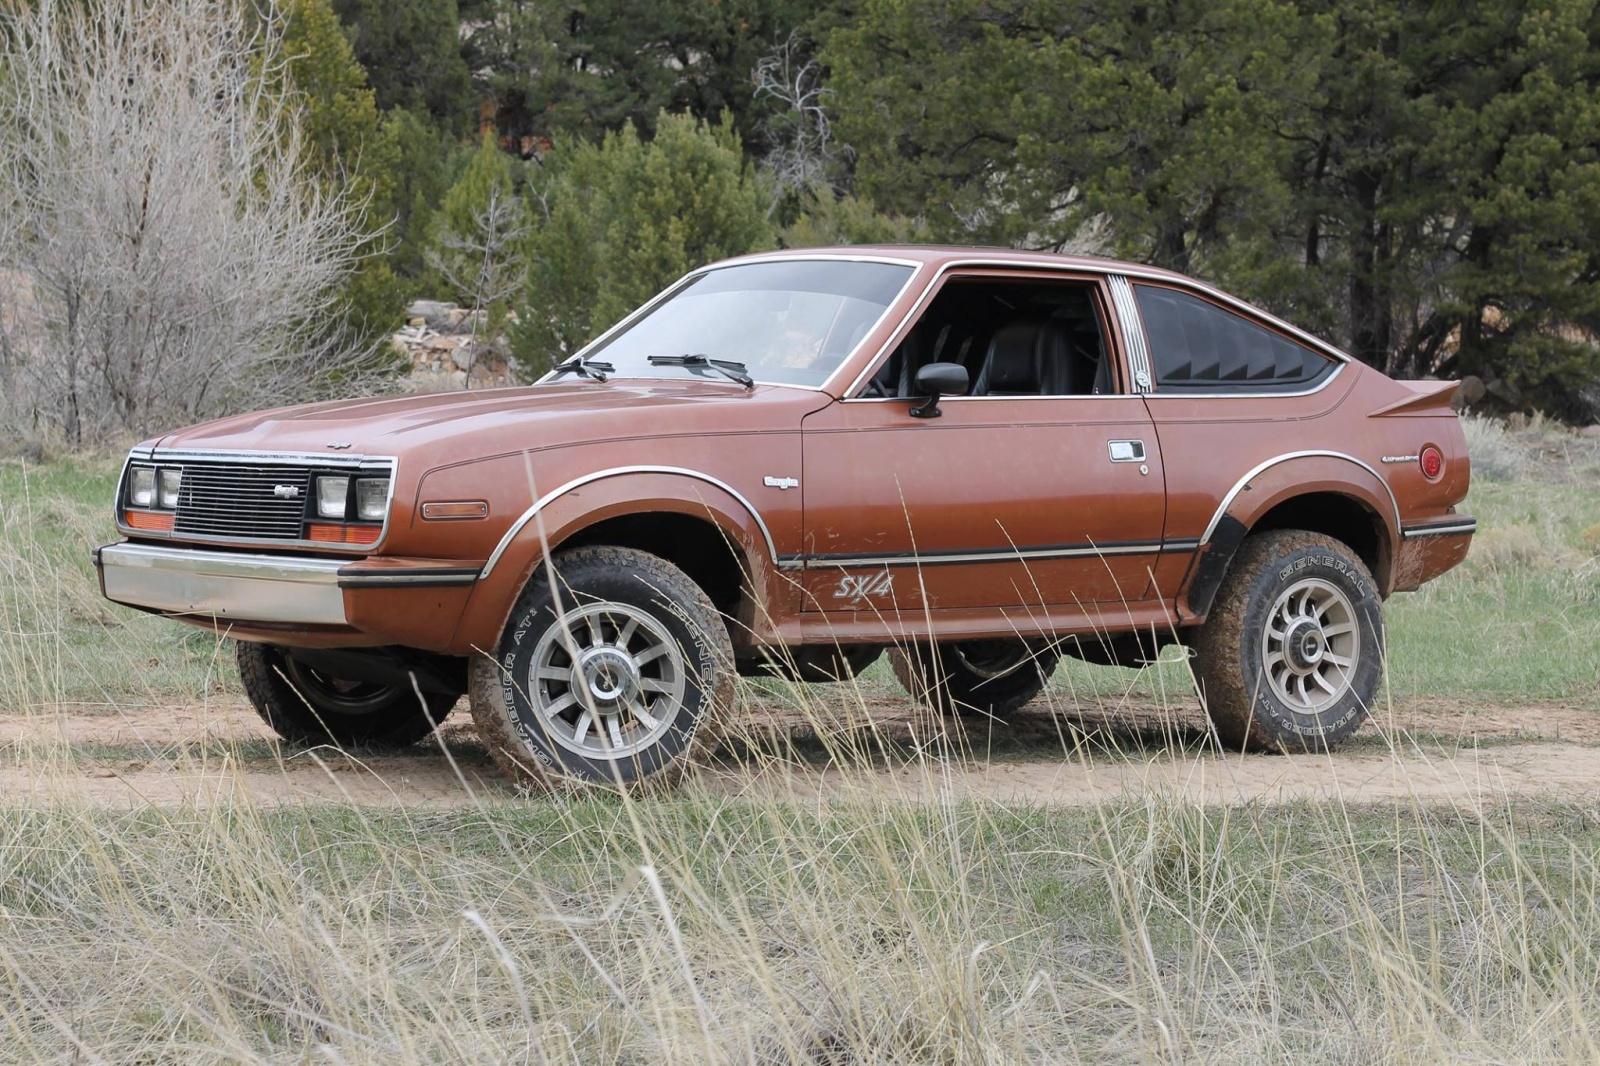 29 Year Owner 1982 Amc Eagle Sx 4